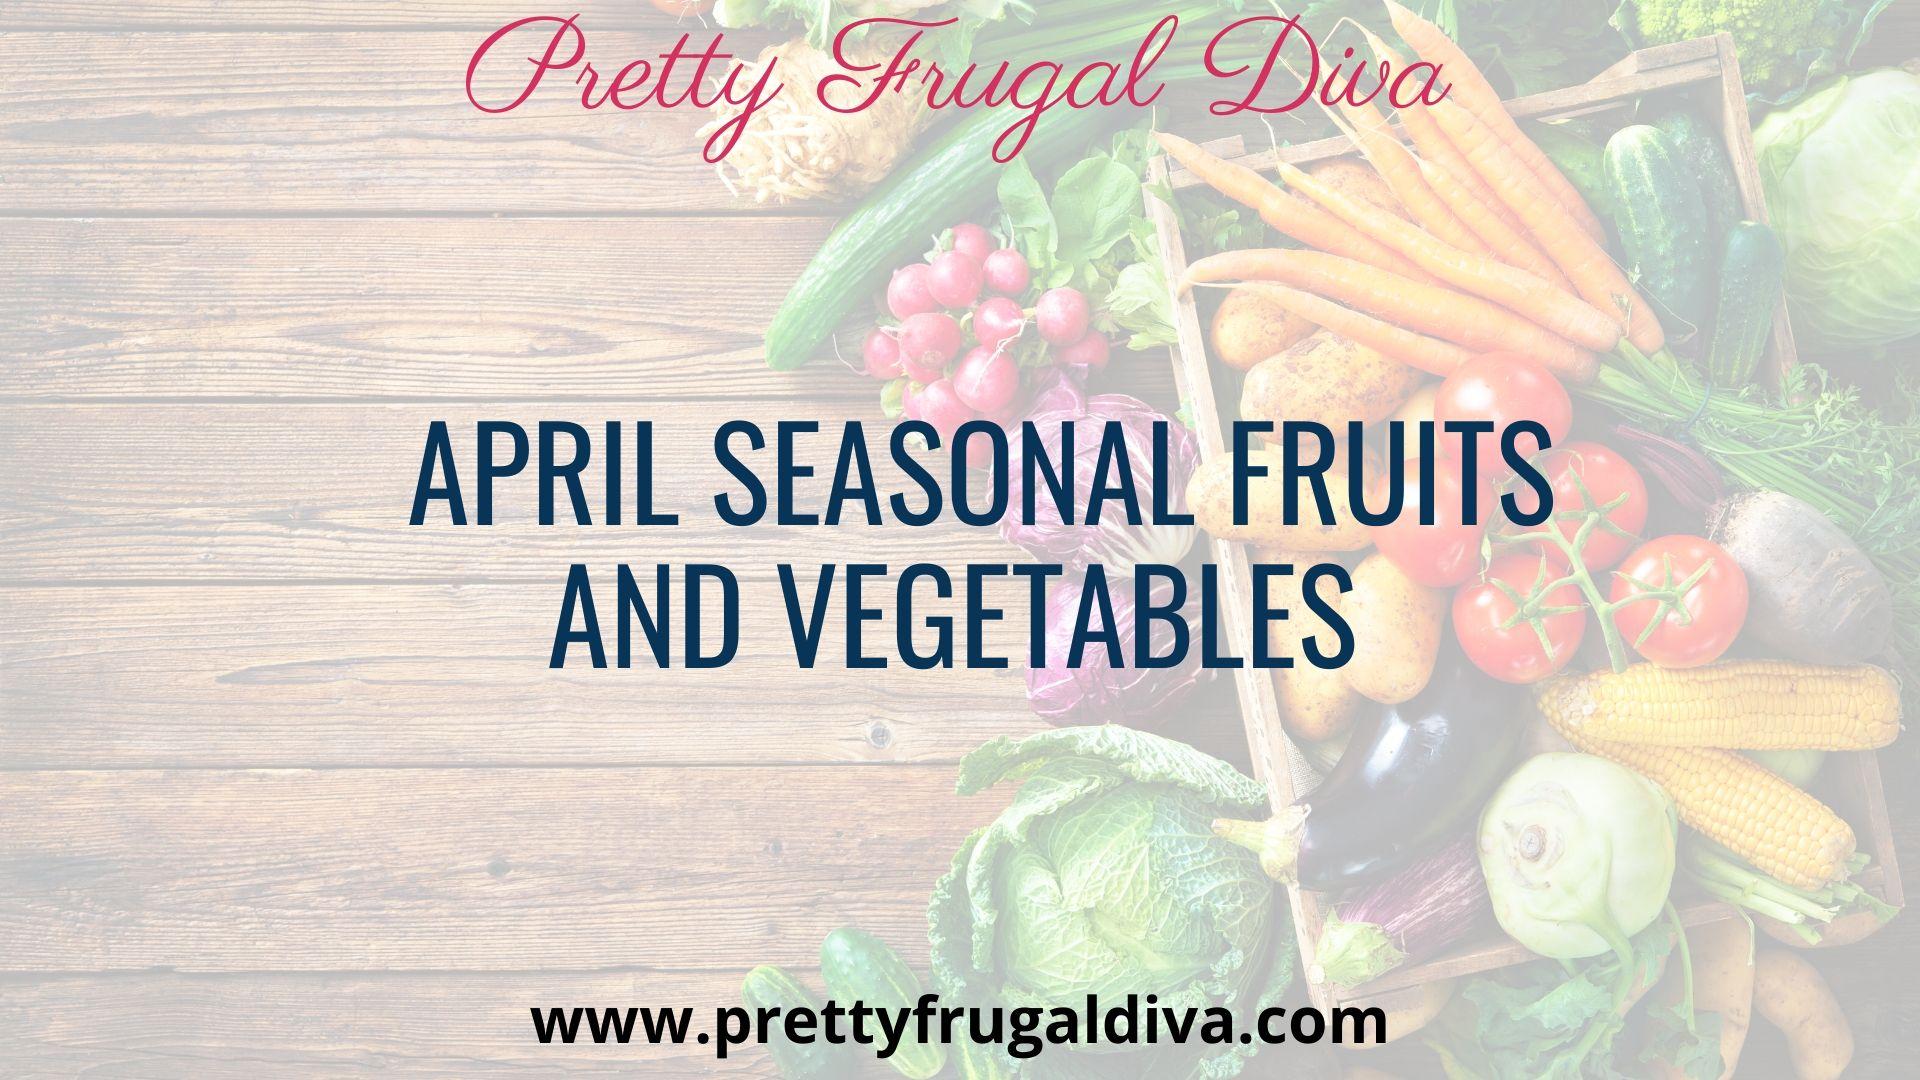 April Seasonal Fruit and Vegetables